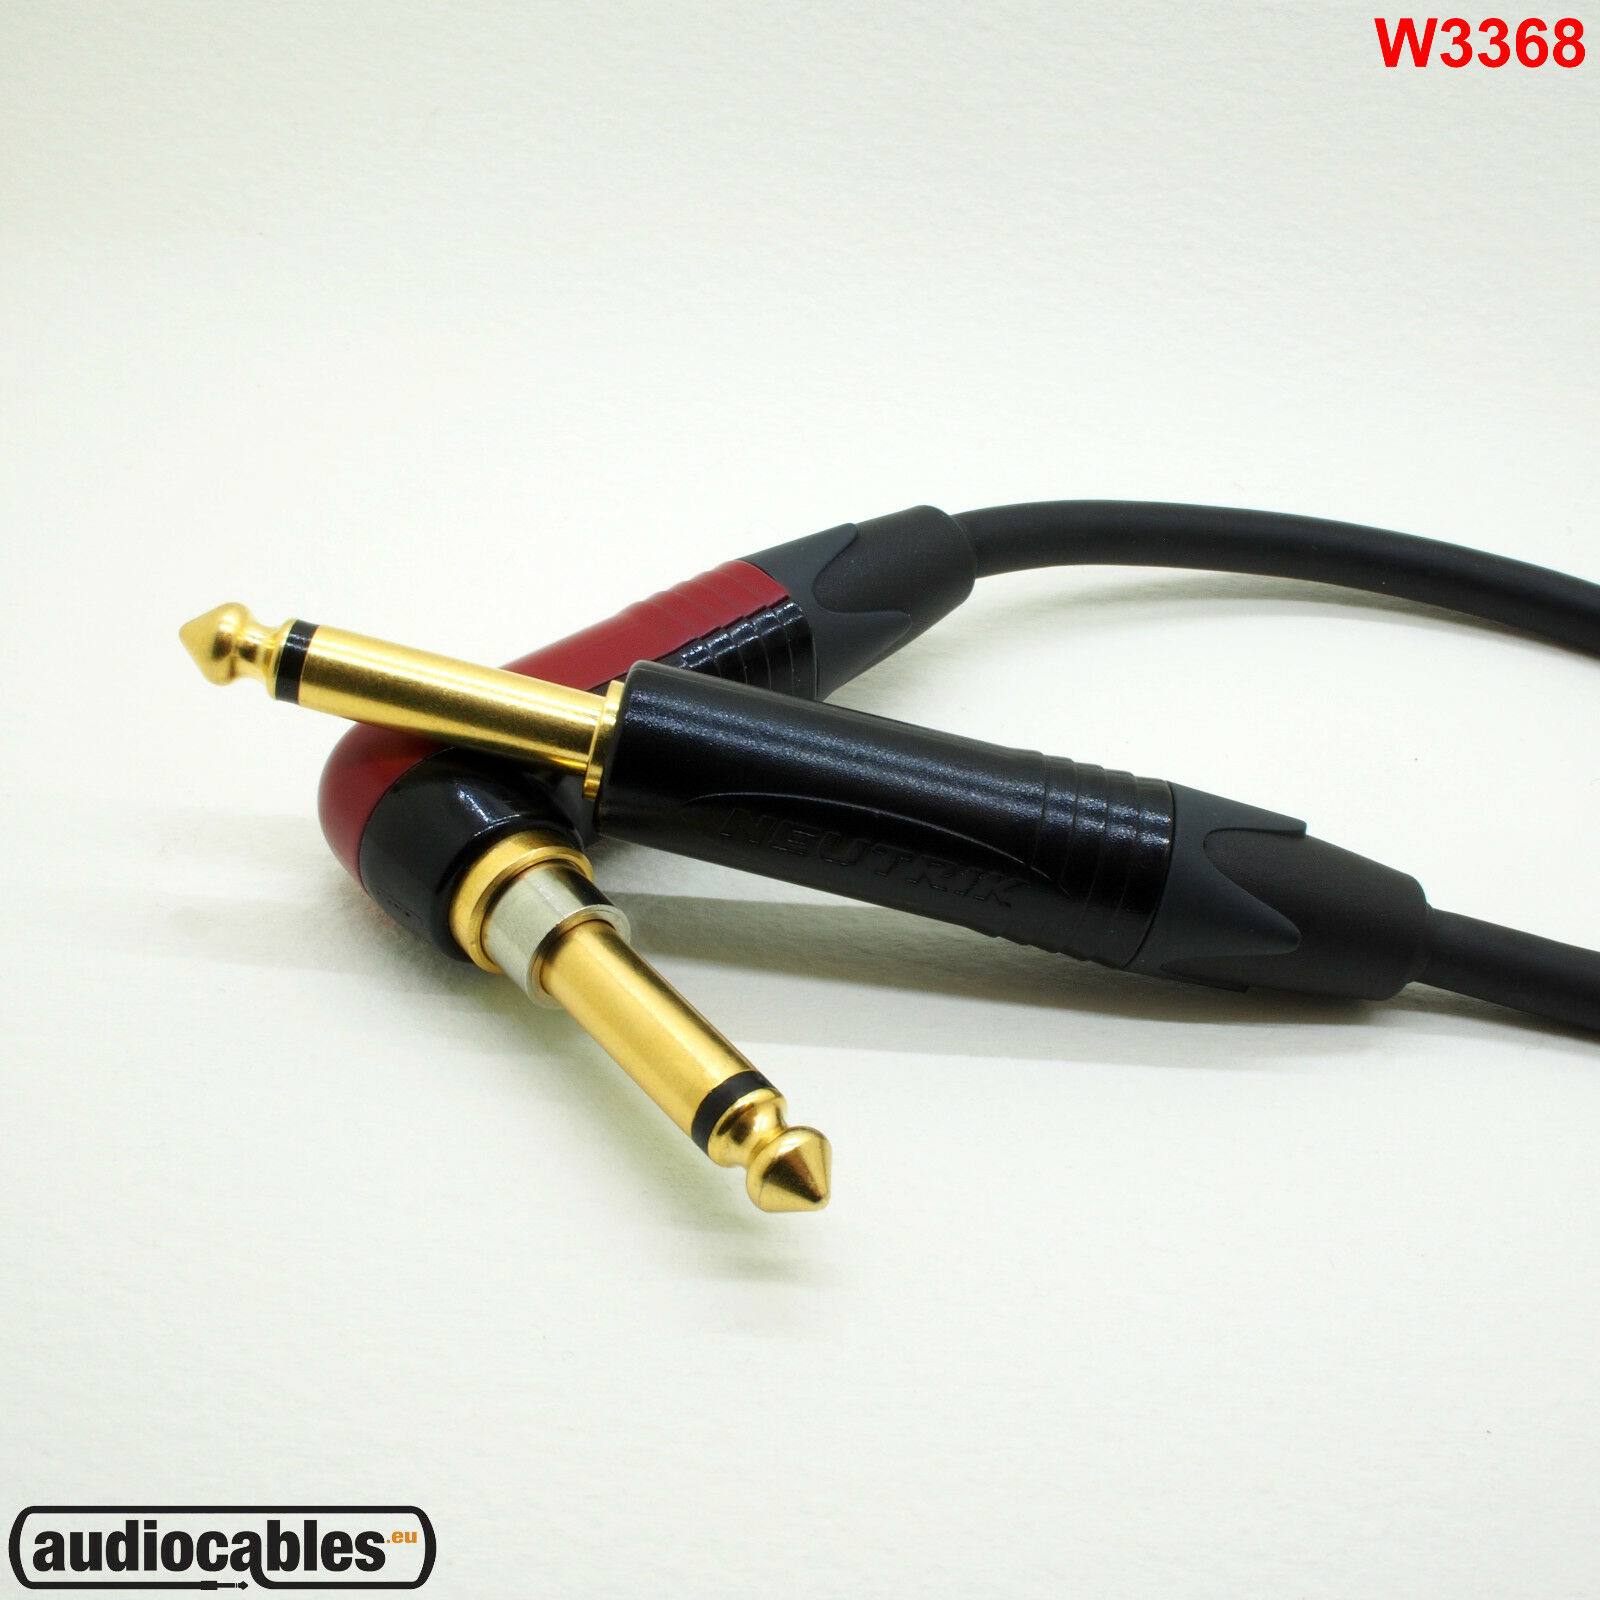 Mogami 3368 Instrument Cable Neutrik Gold Jack Silent Single Angled, Advanced